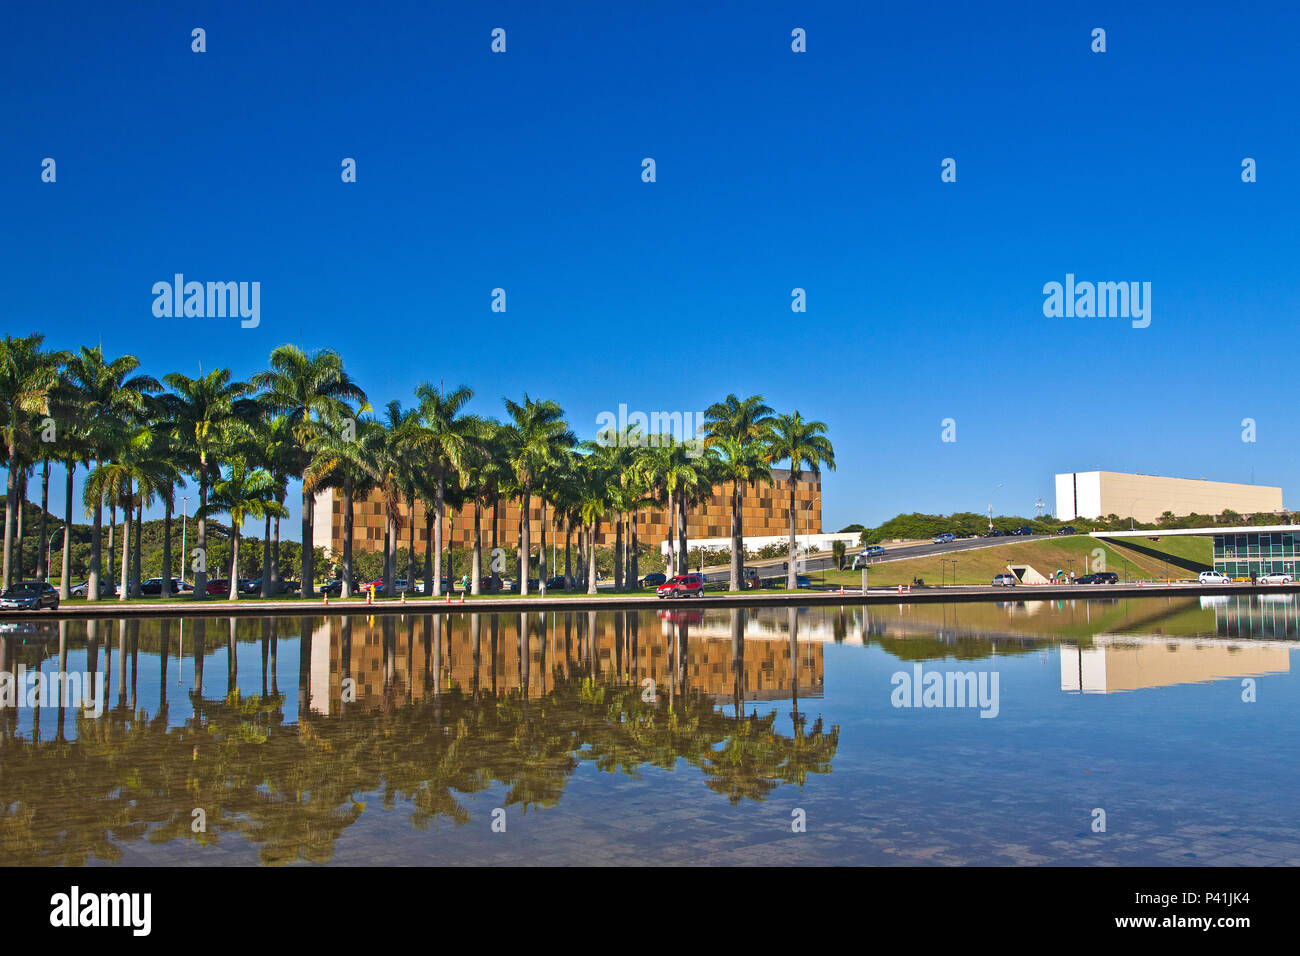 Brasília - DF Brasília Cidade de Brasília Lago do Congresso Nacional Distrito Federal Brasil Centro Oeste - Stock Image